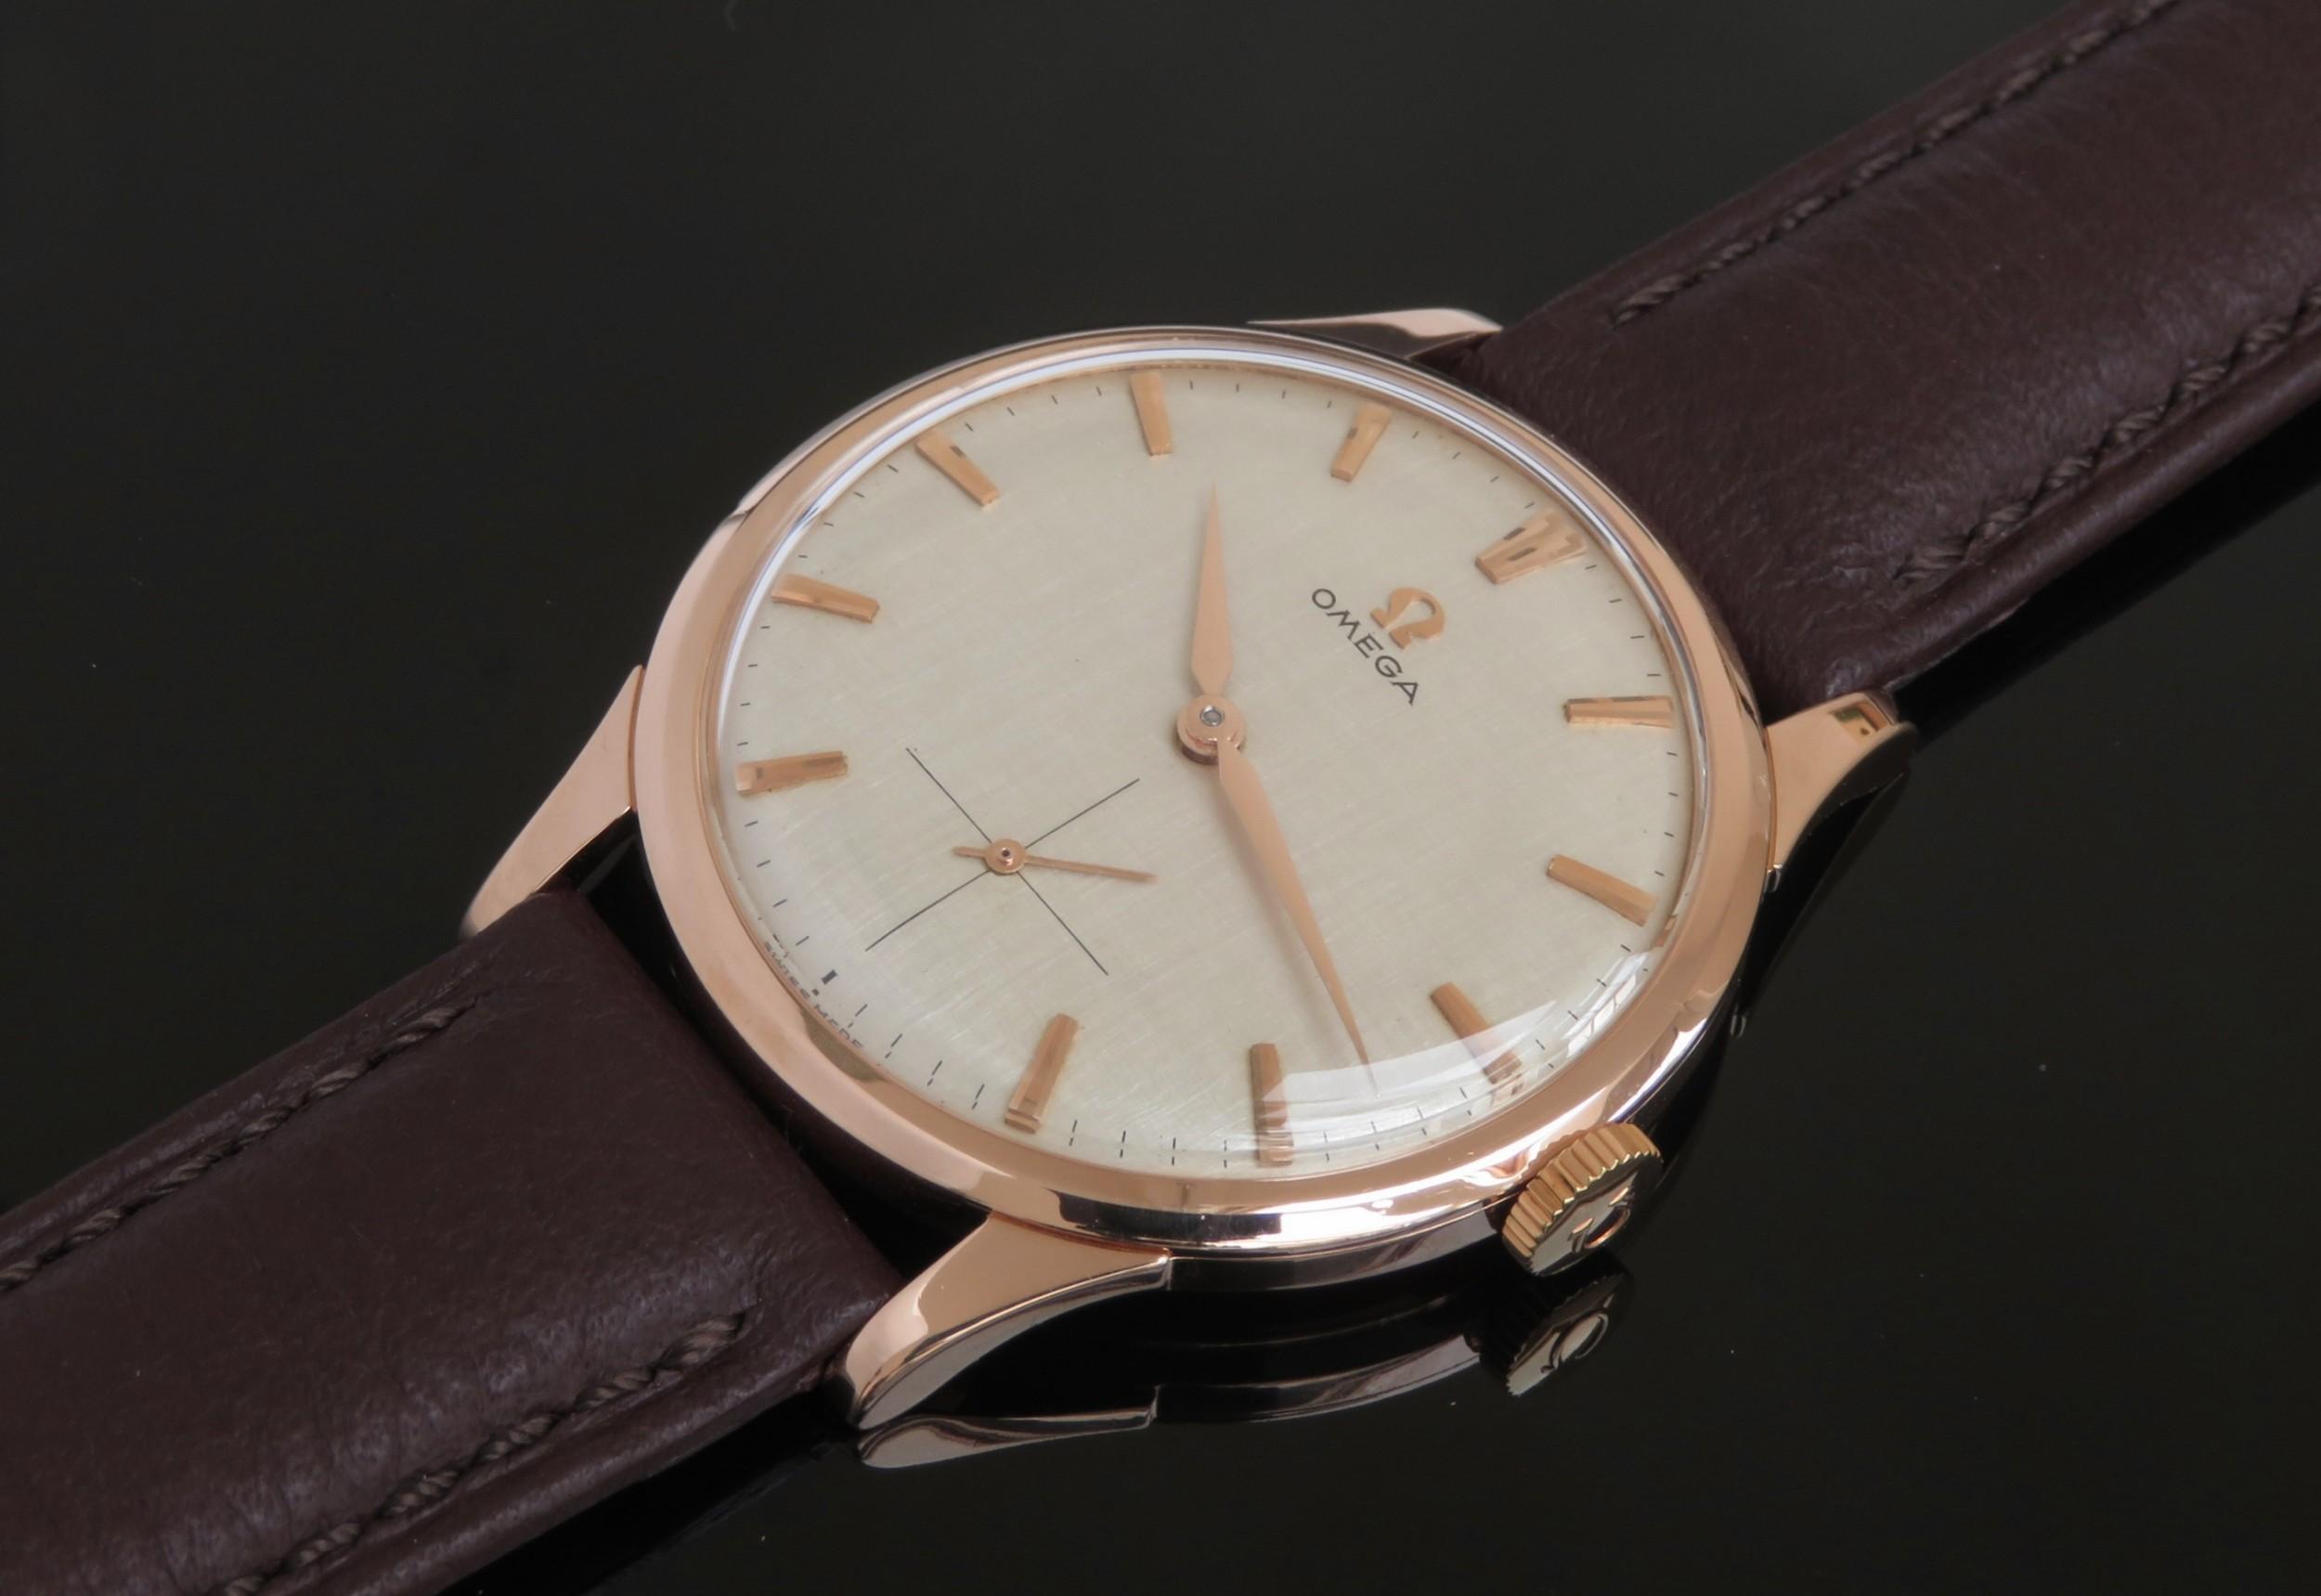 mint condition solid 18ct 18k rose gold omega calibre 267 mens vintage watch c1960